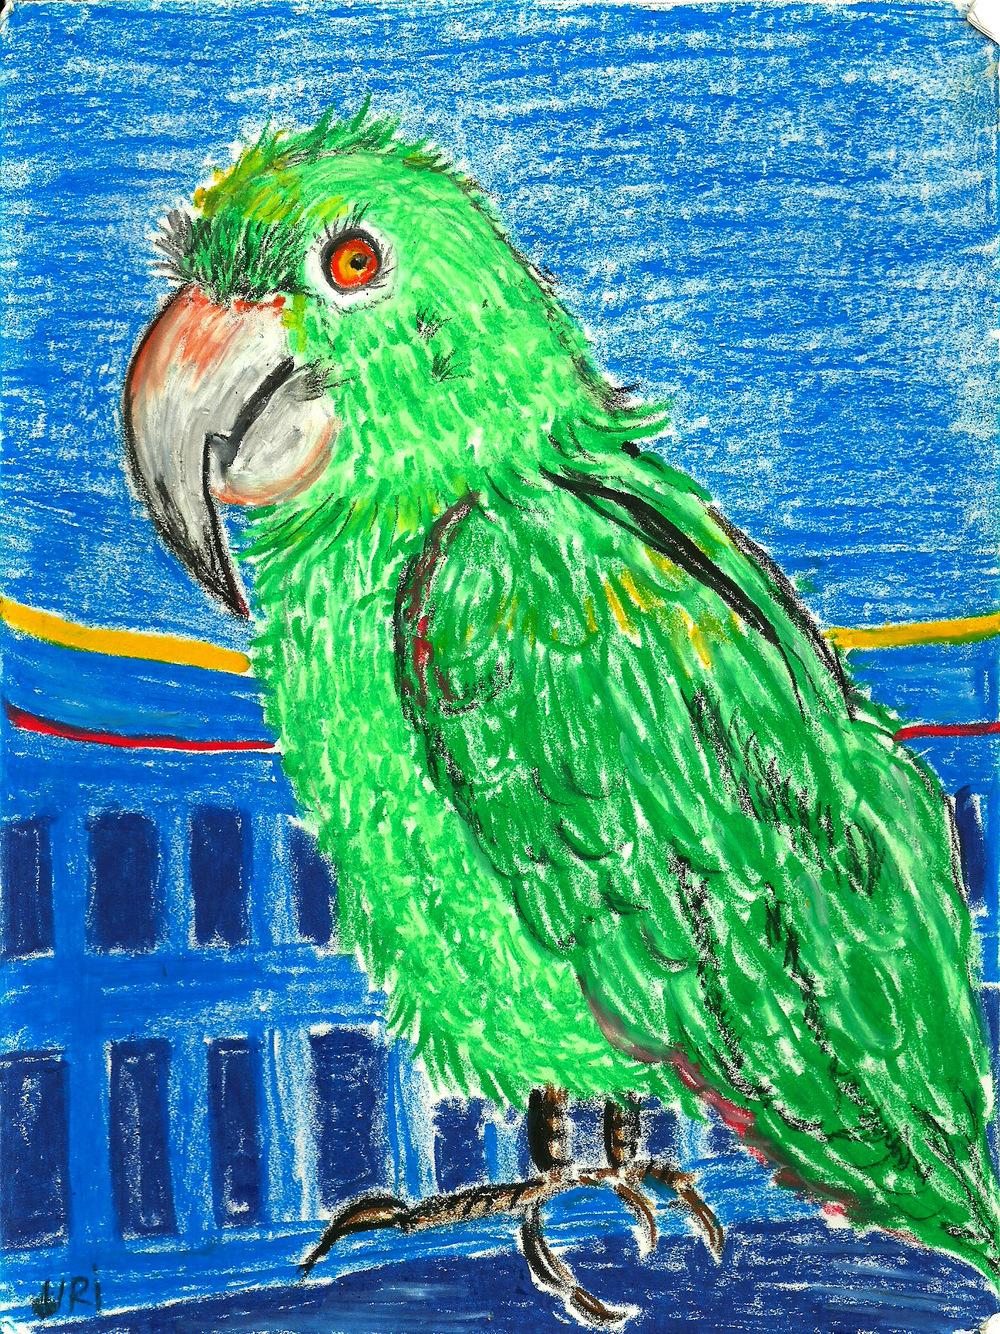 macaw0001.jpg